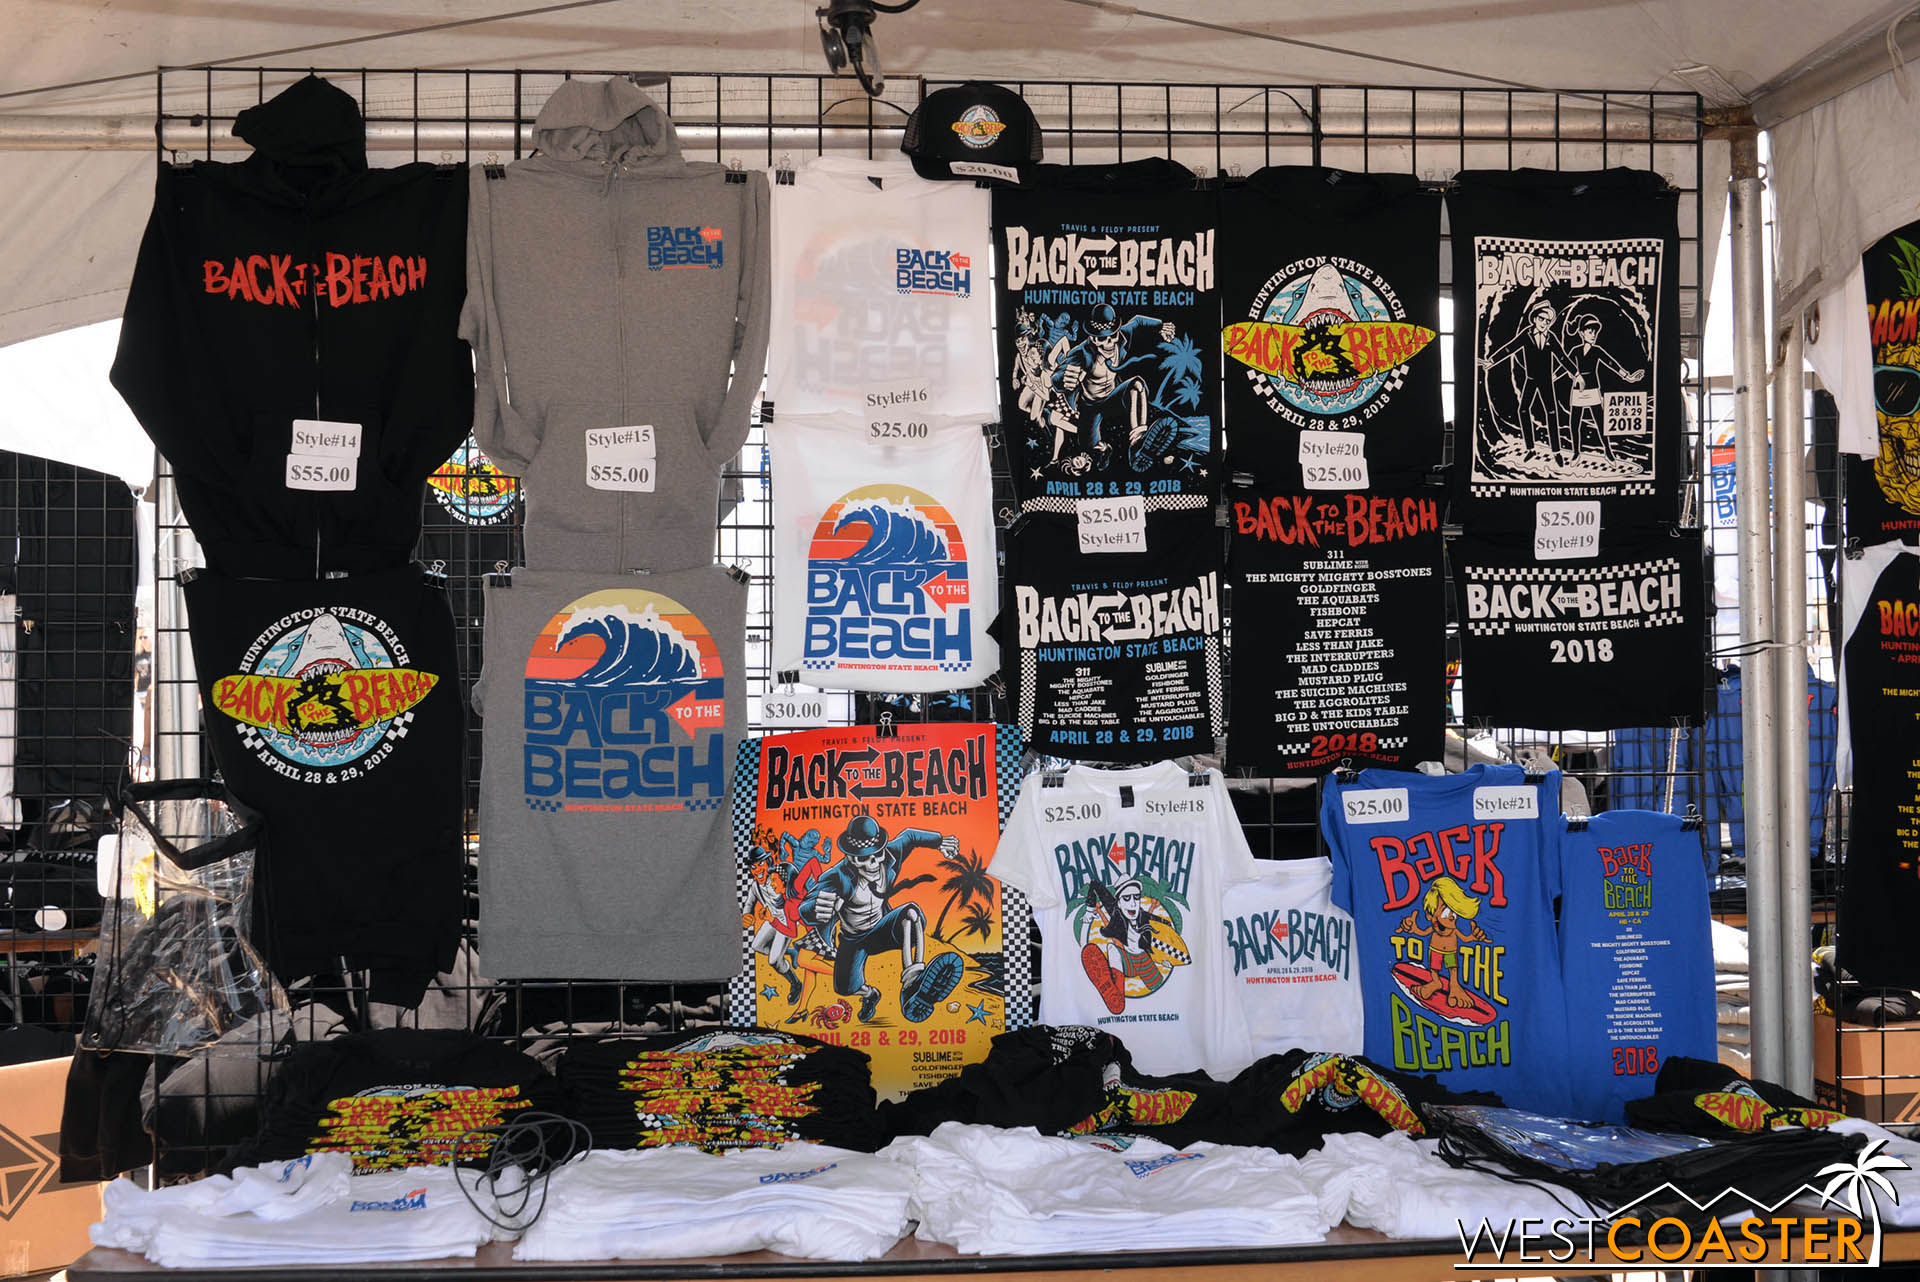 Plenty of merchandise on sale.